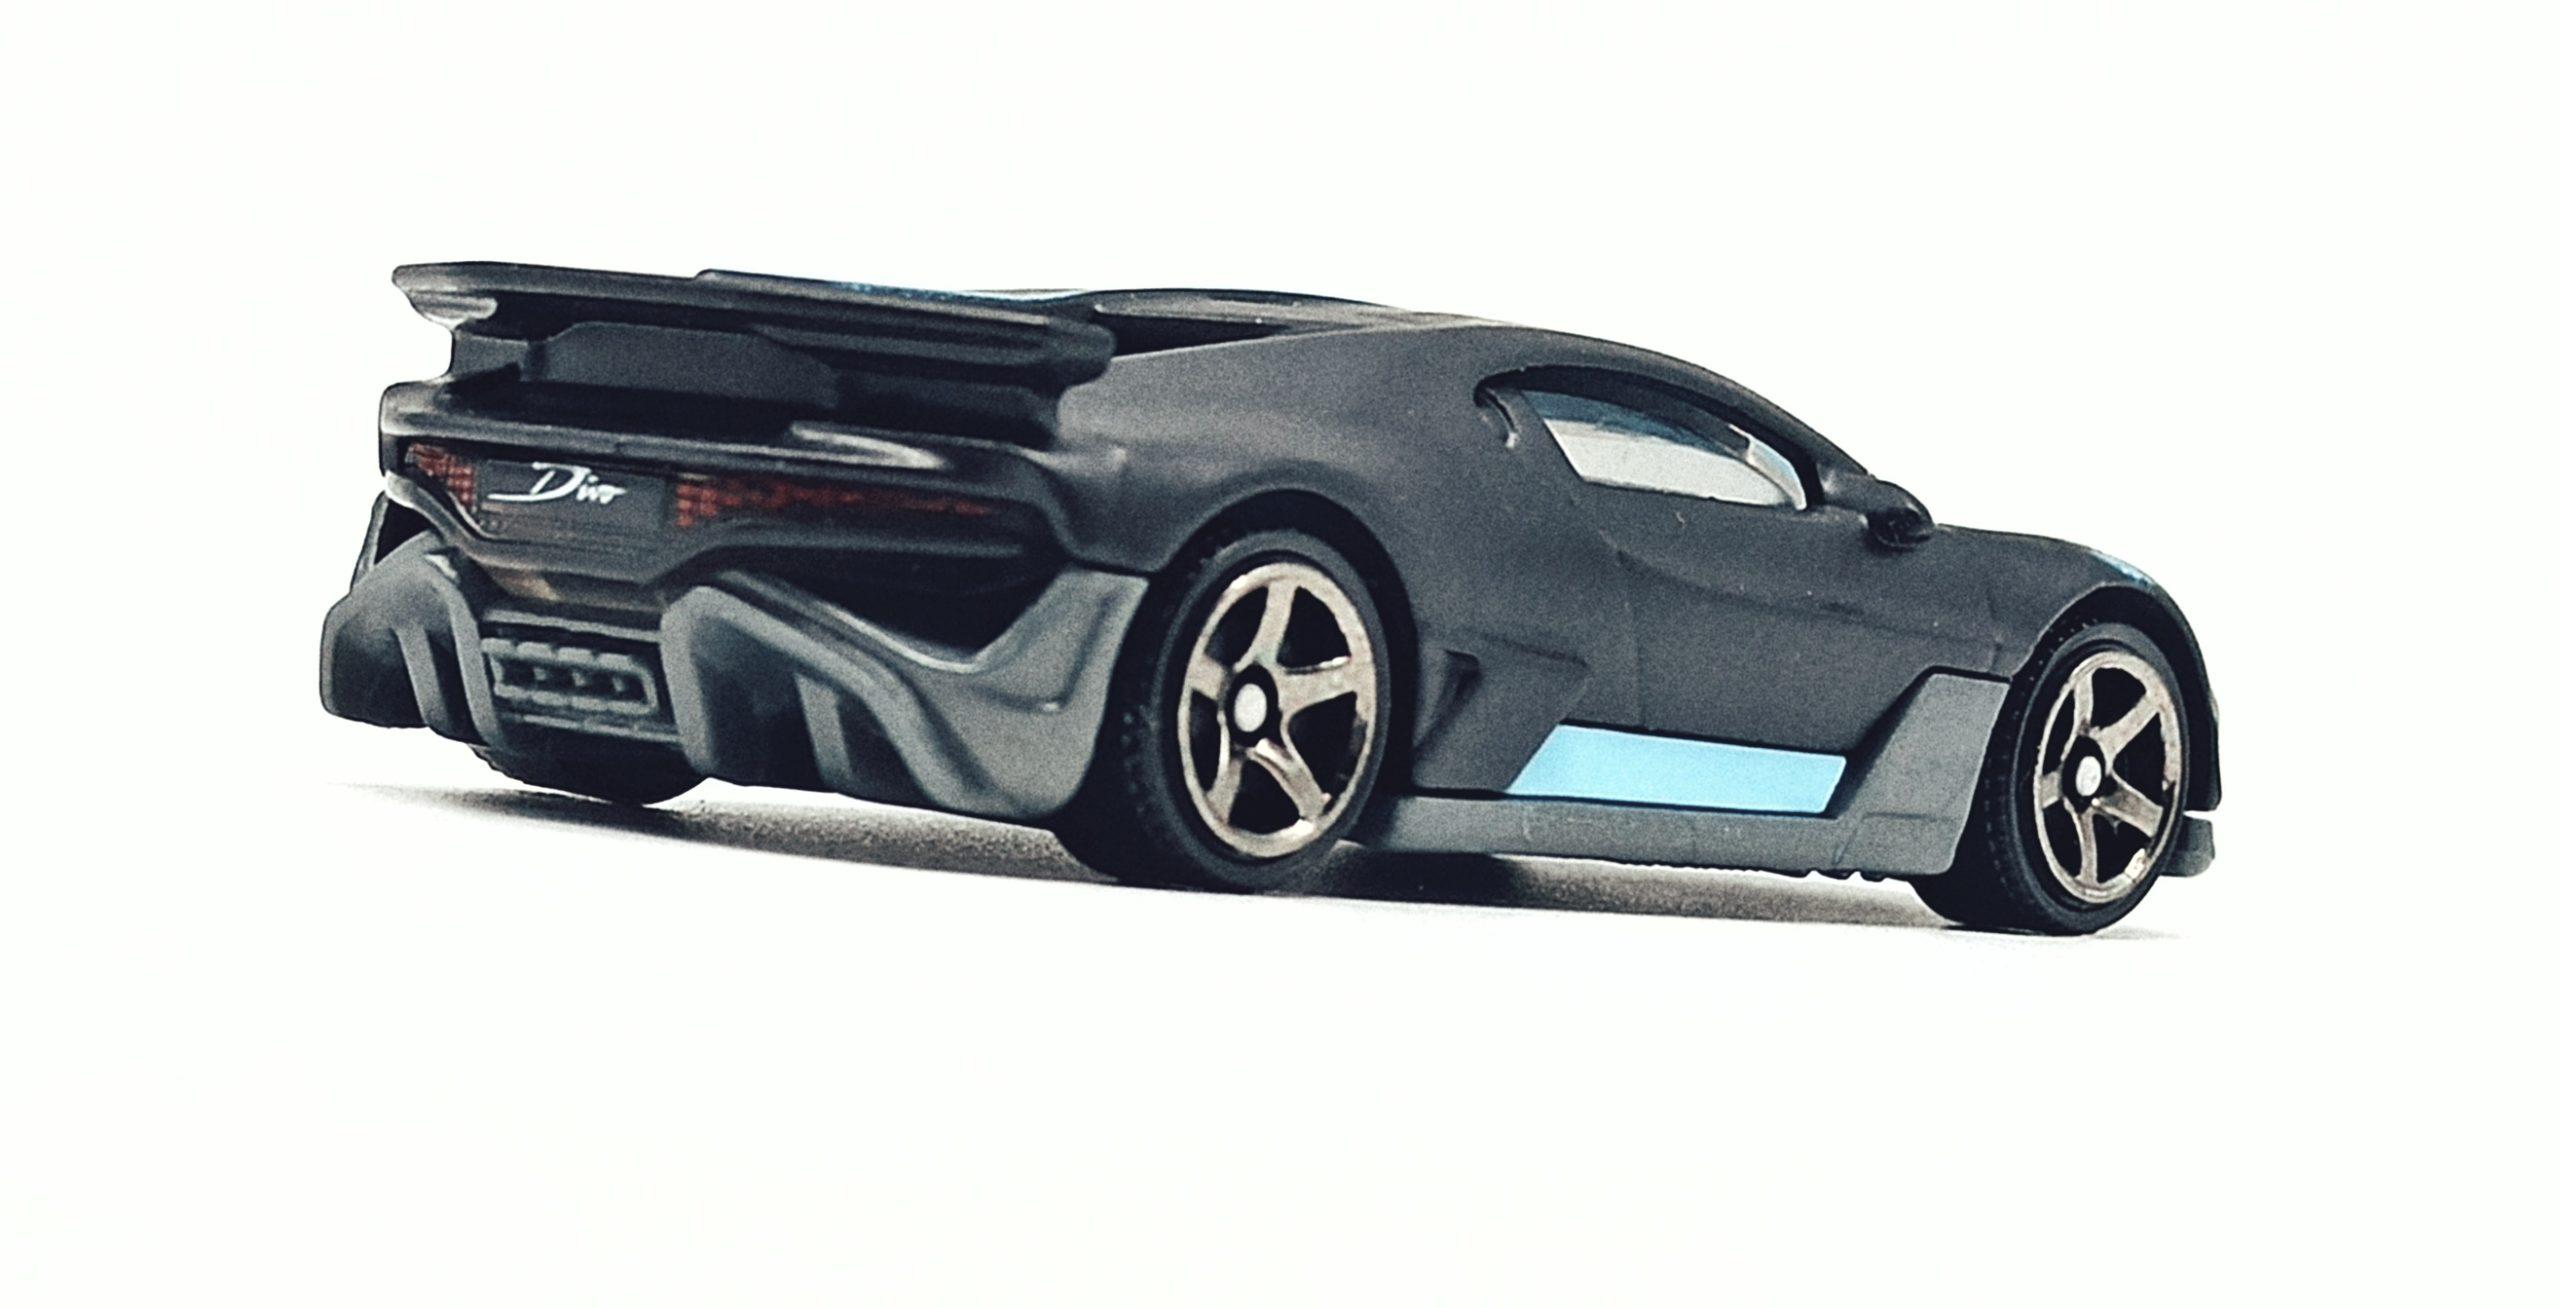 Matchbox 2018 Bugatti Divo (MB39) 2021 MBX Showroom matte black back angle